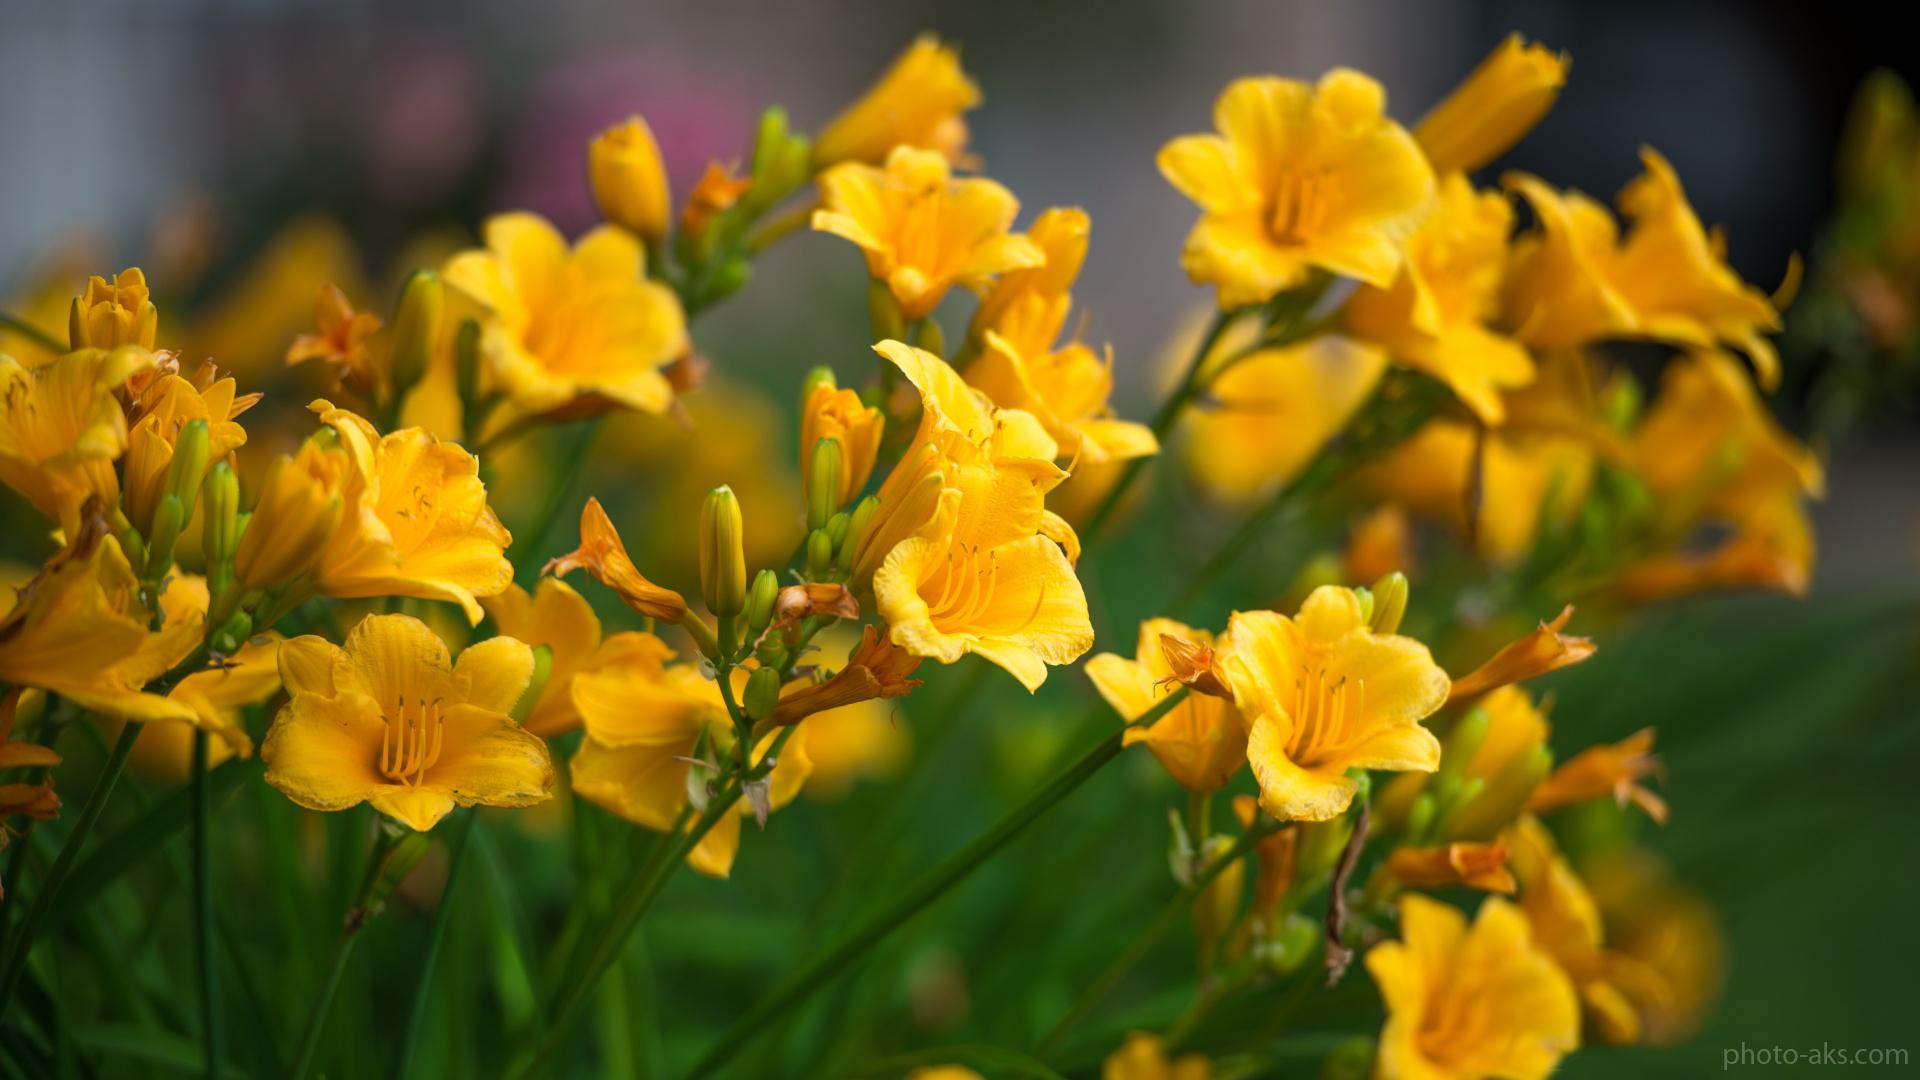 http://s5.picofile.com/file/8146752226/lily_flowers_wallpaper.jpg